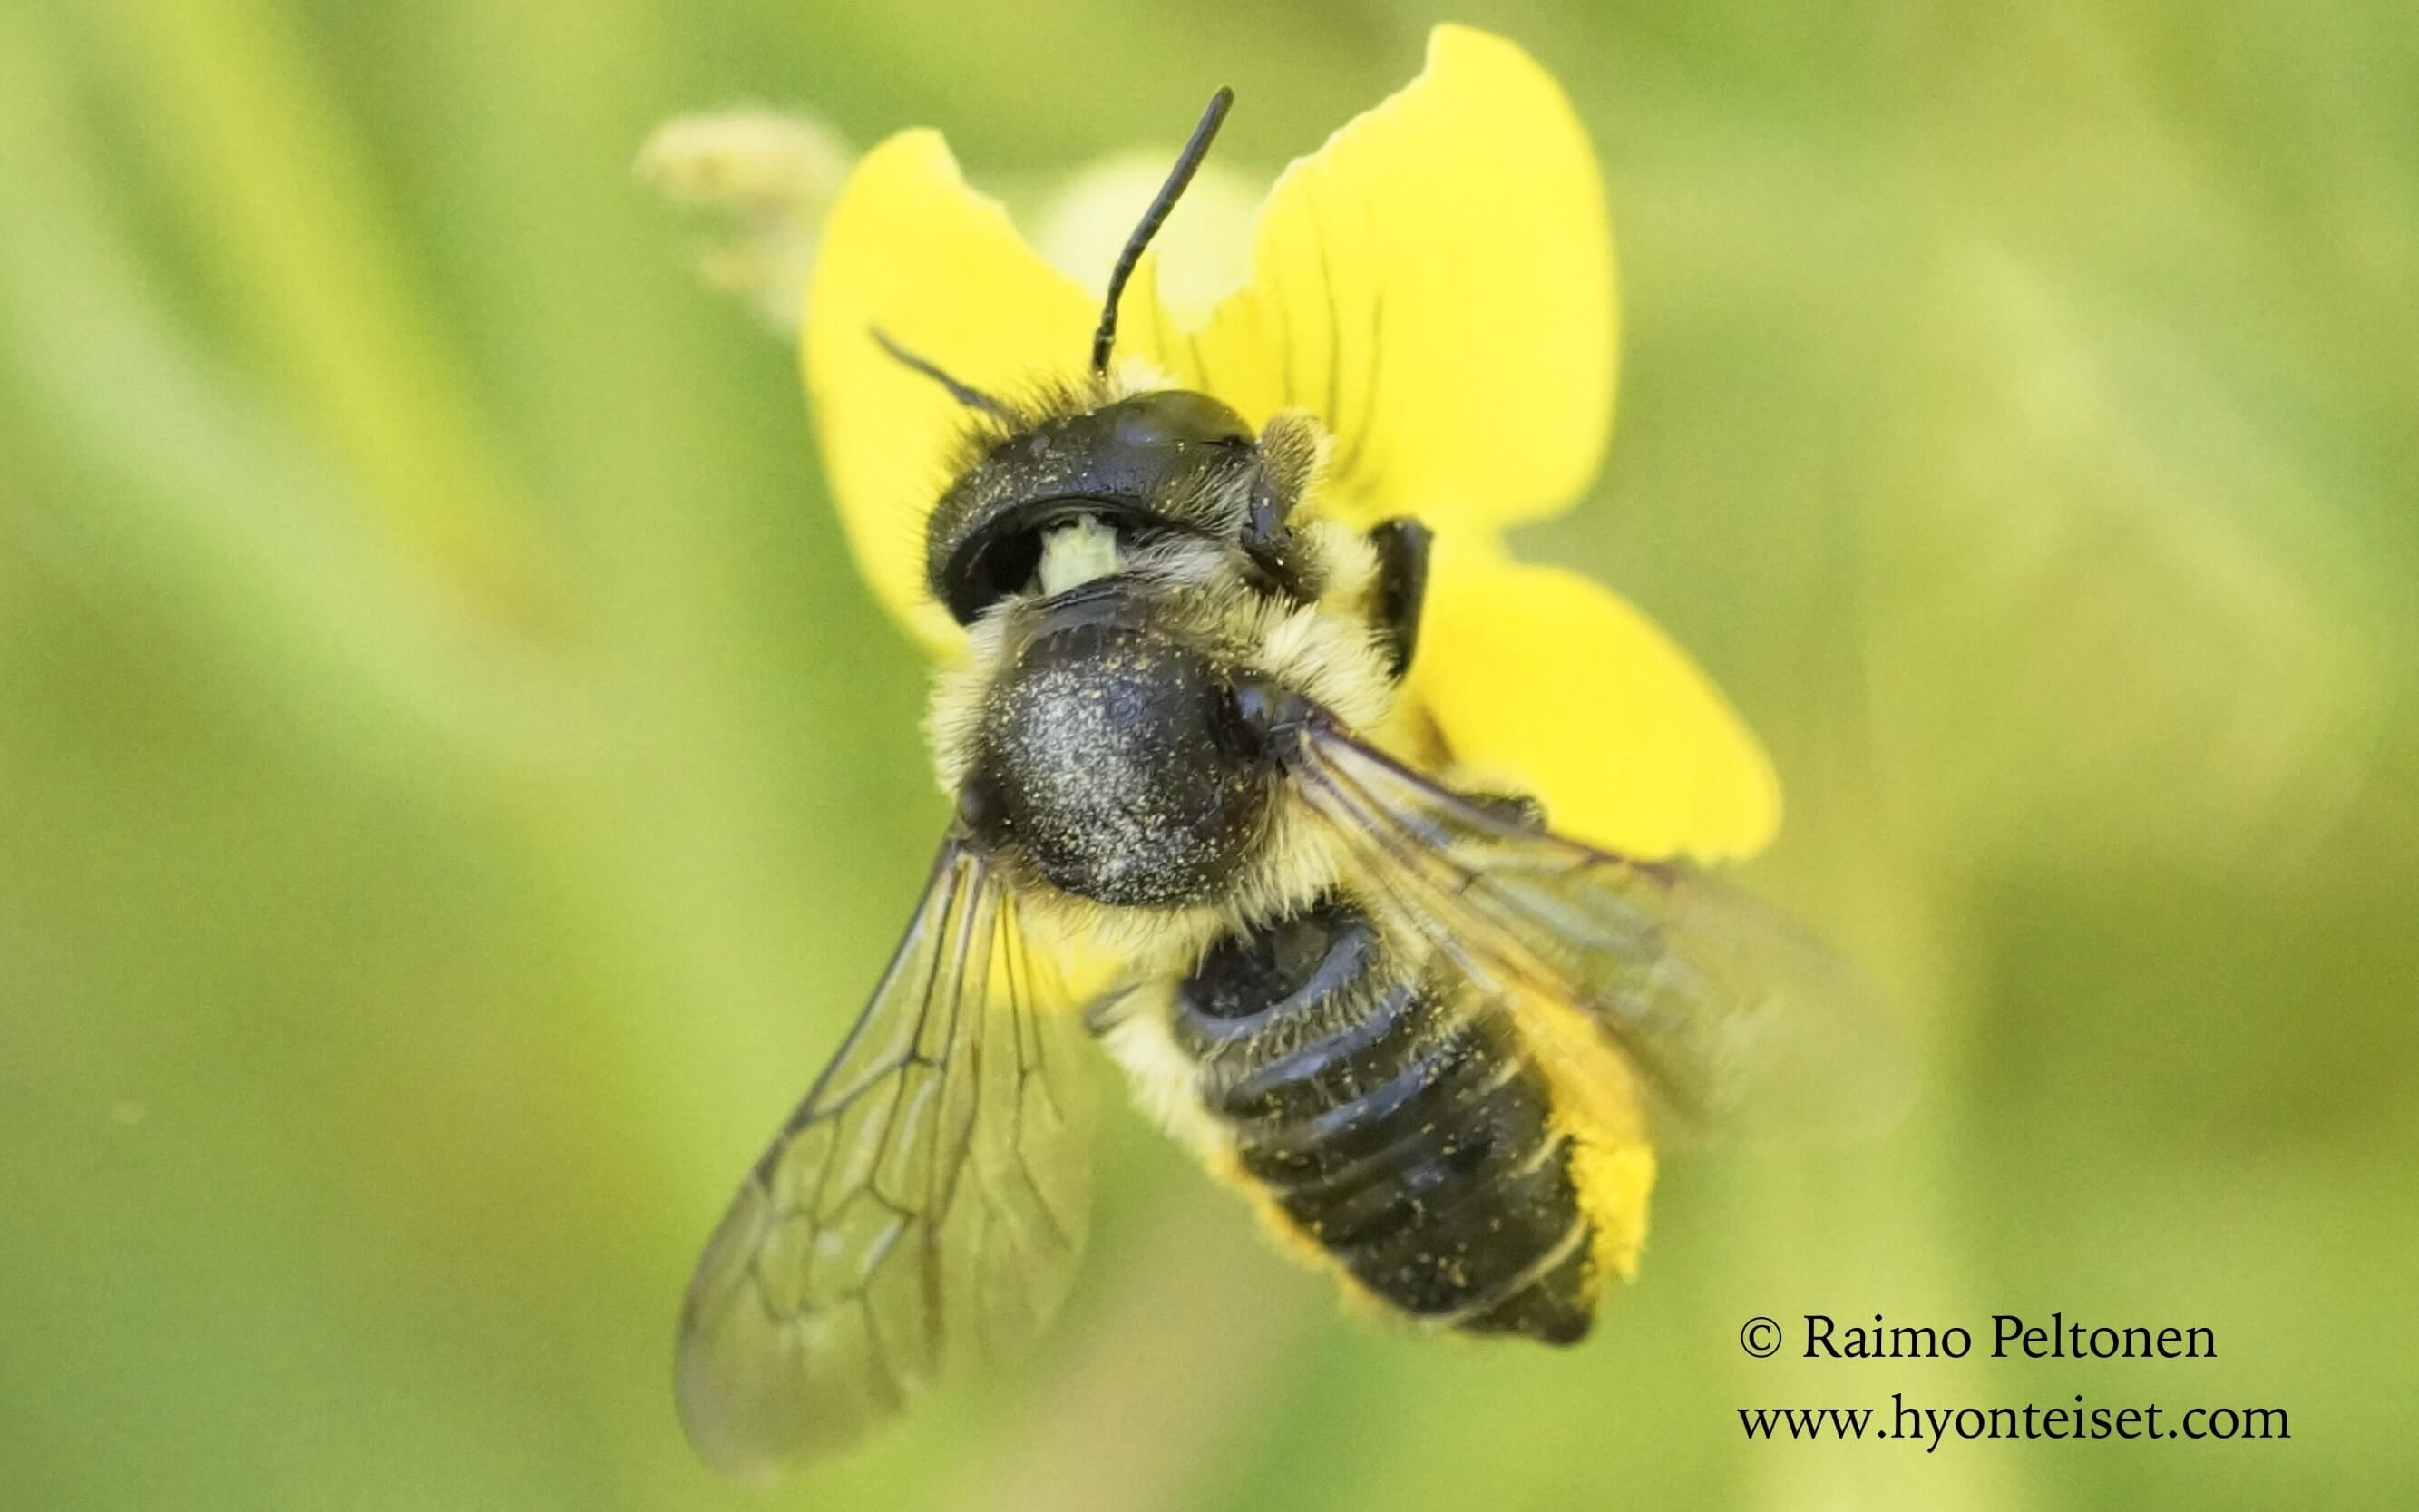 Megachile sp., naaras (det. Juho Paukkunen)